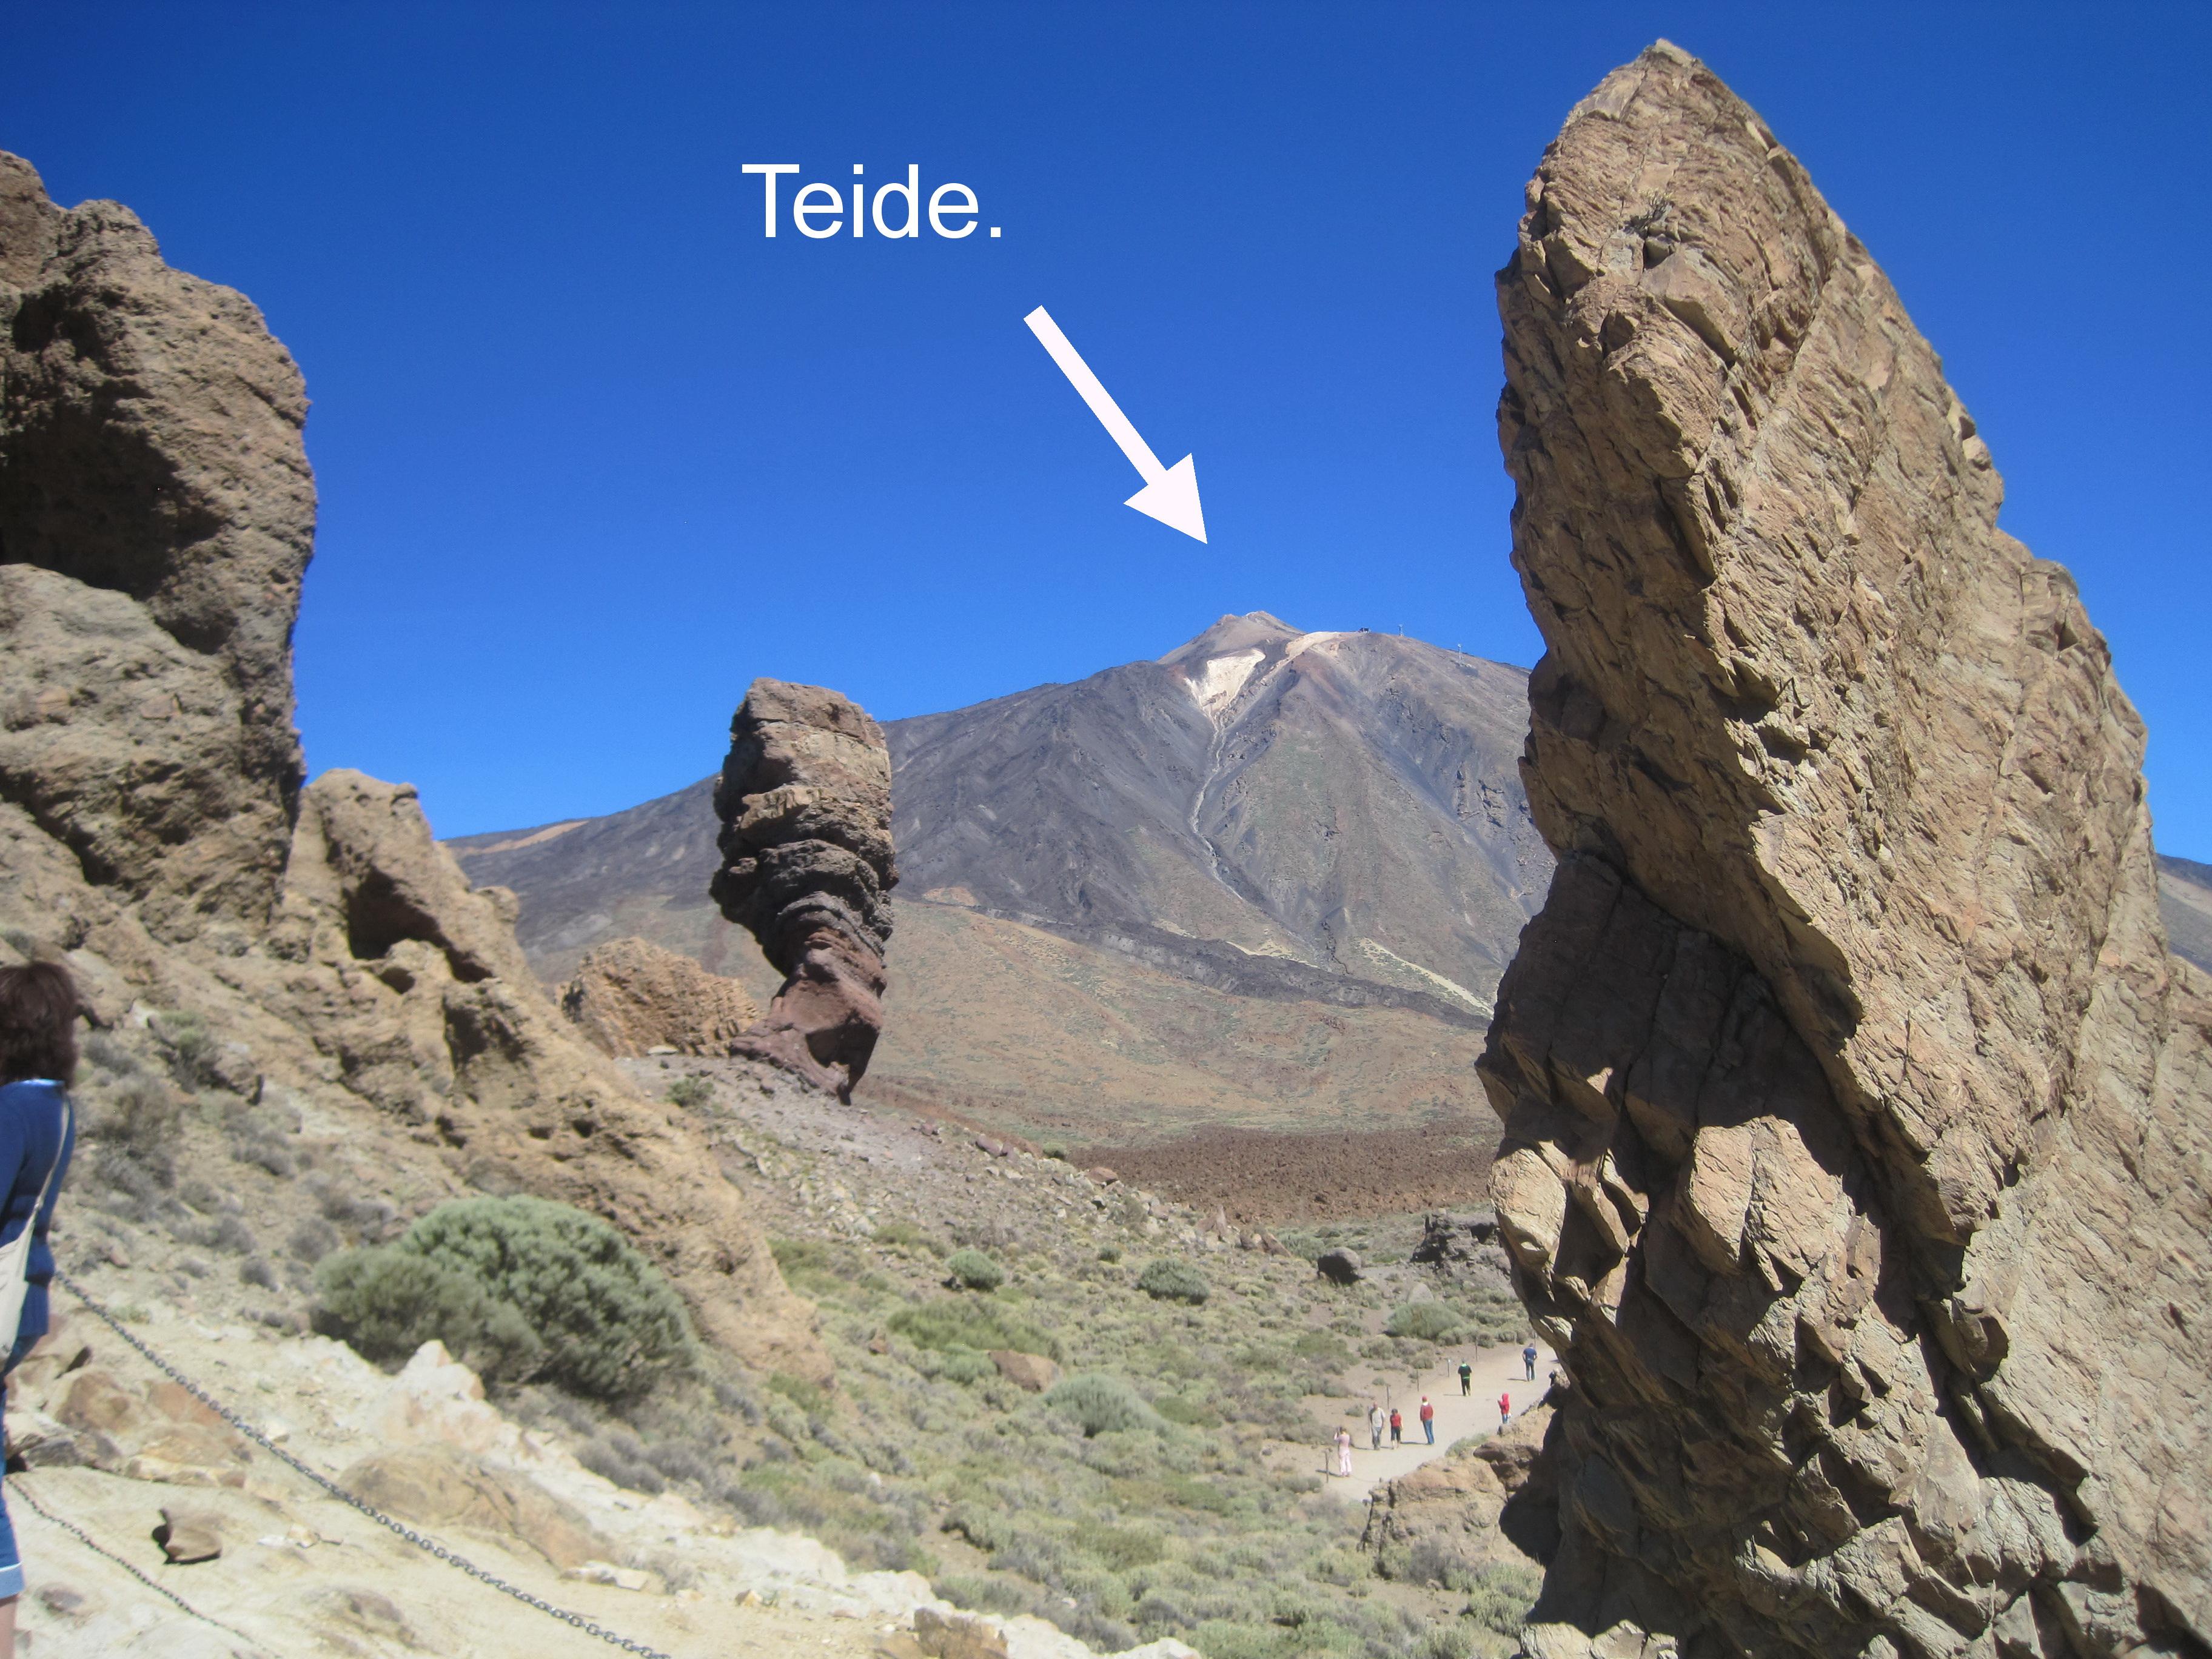 Klipper ved Teide